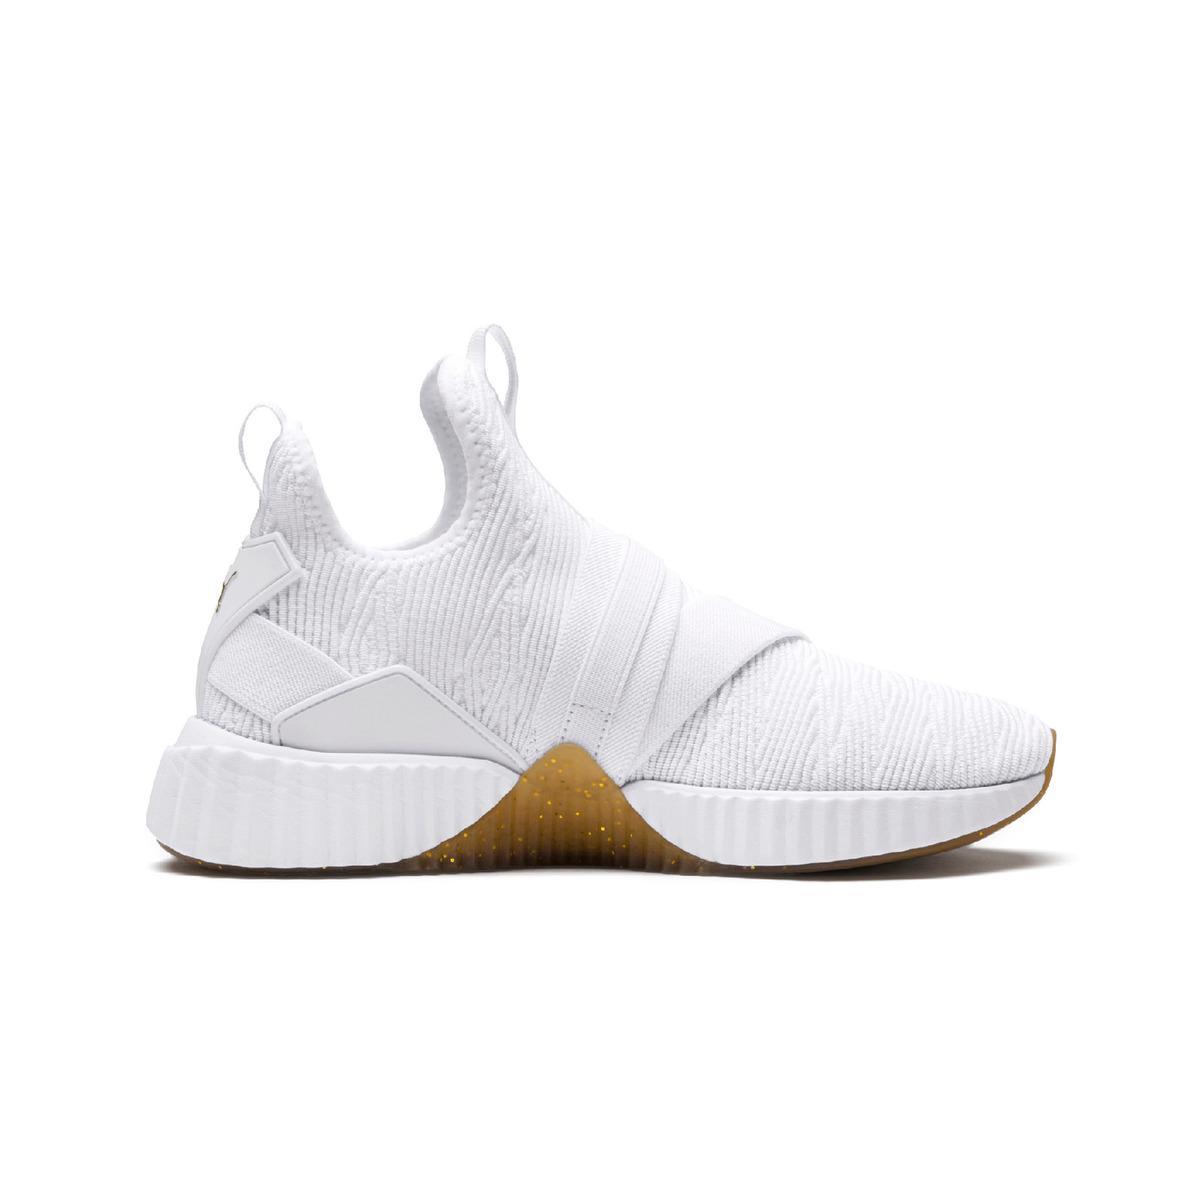 9c1e36a6e89 PUMA Defy Mid Varsity Fitness cross Training Shoes in White - Lyst